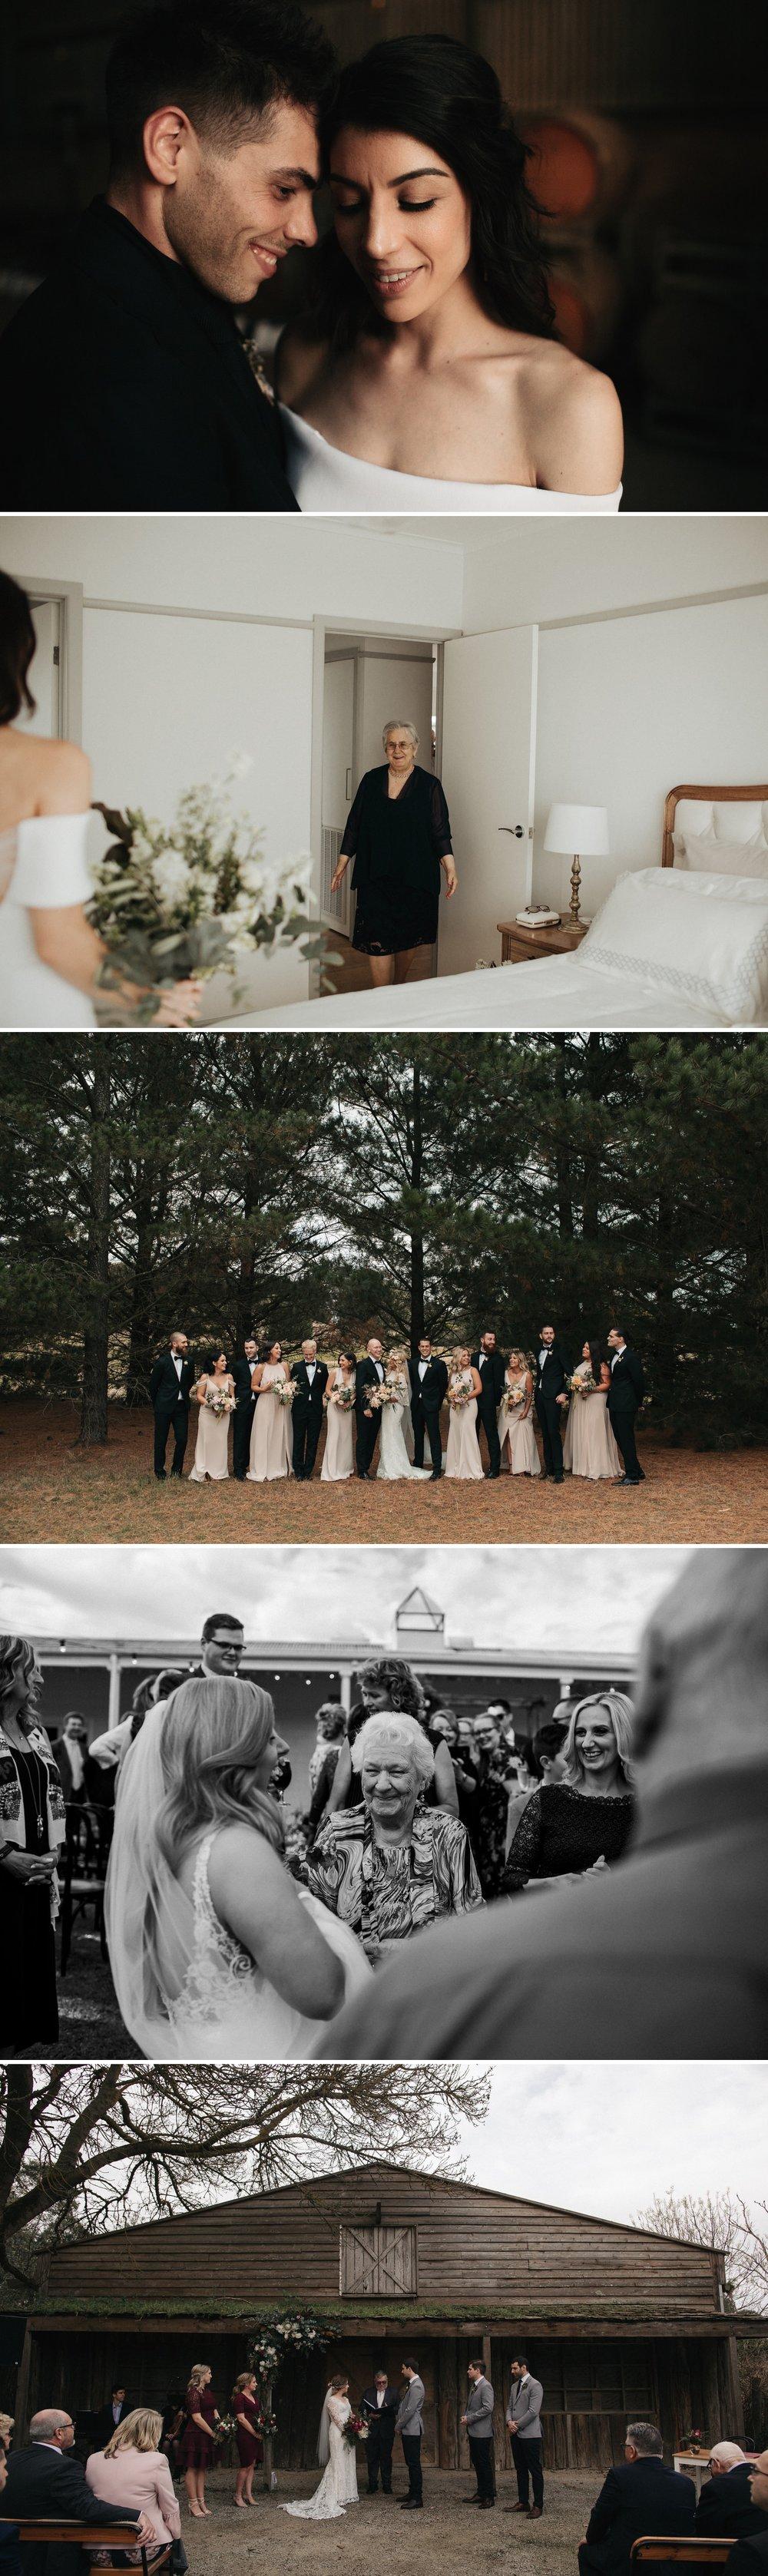 relaxed-wedding-photographer-melbourne_0007.jpg